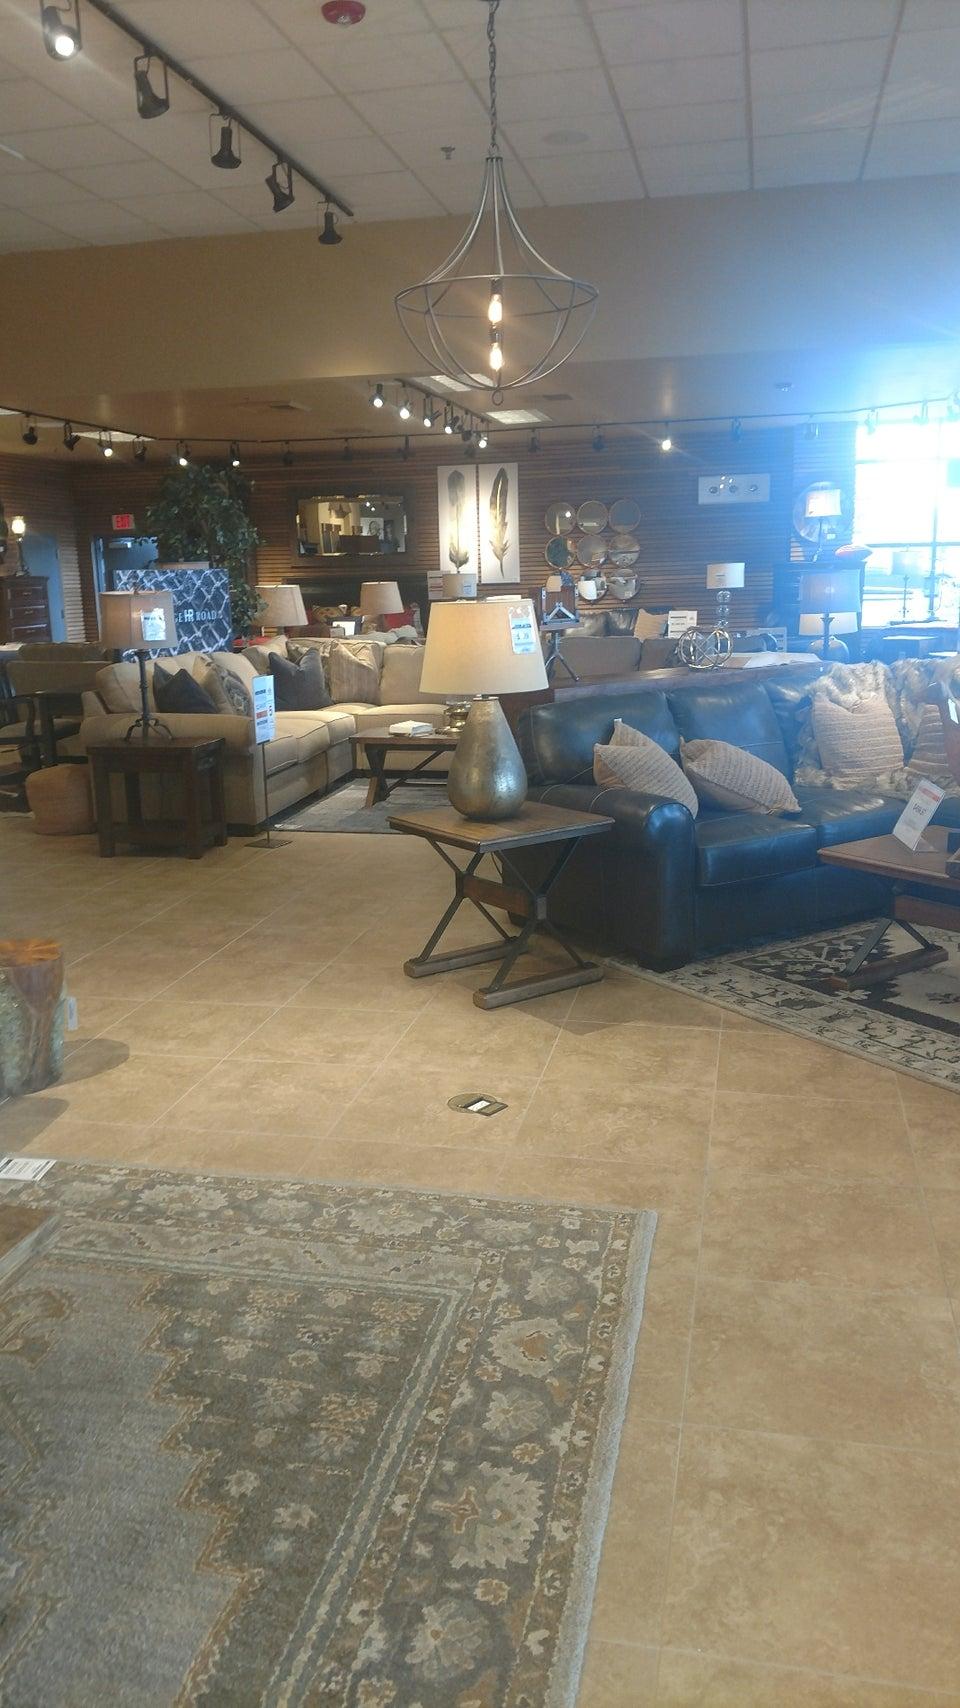 Ashley Furniture HomeStore 2508 S 38th St, Tacoma